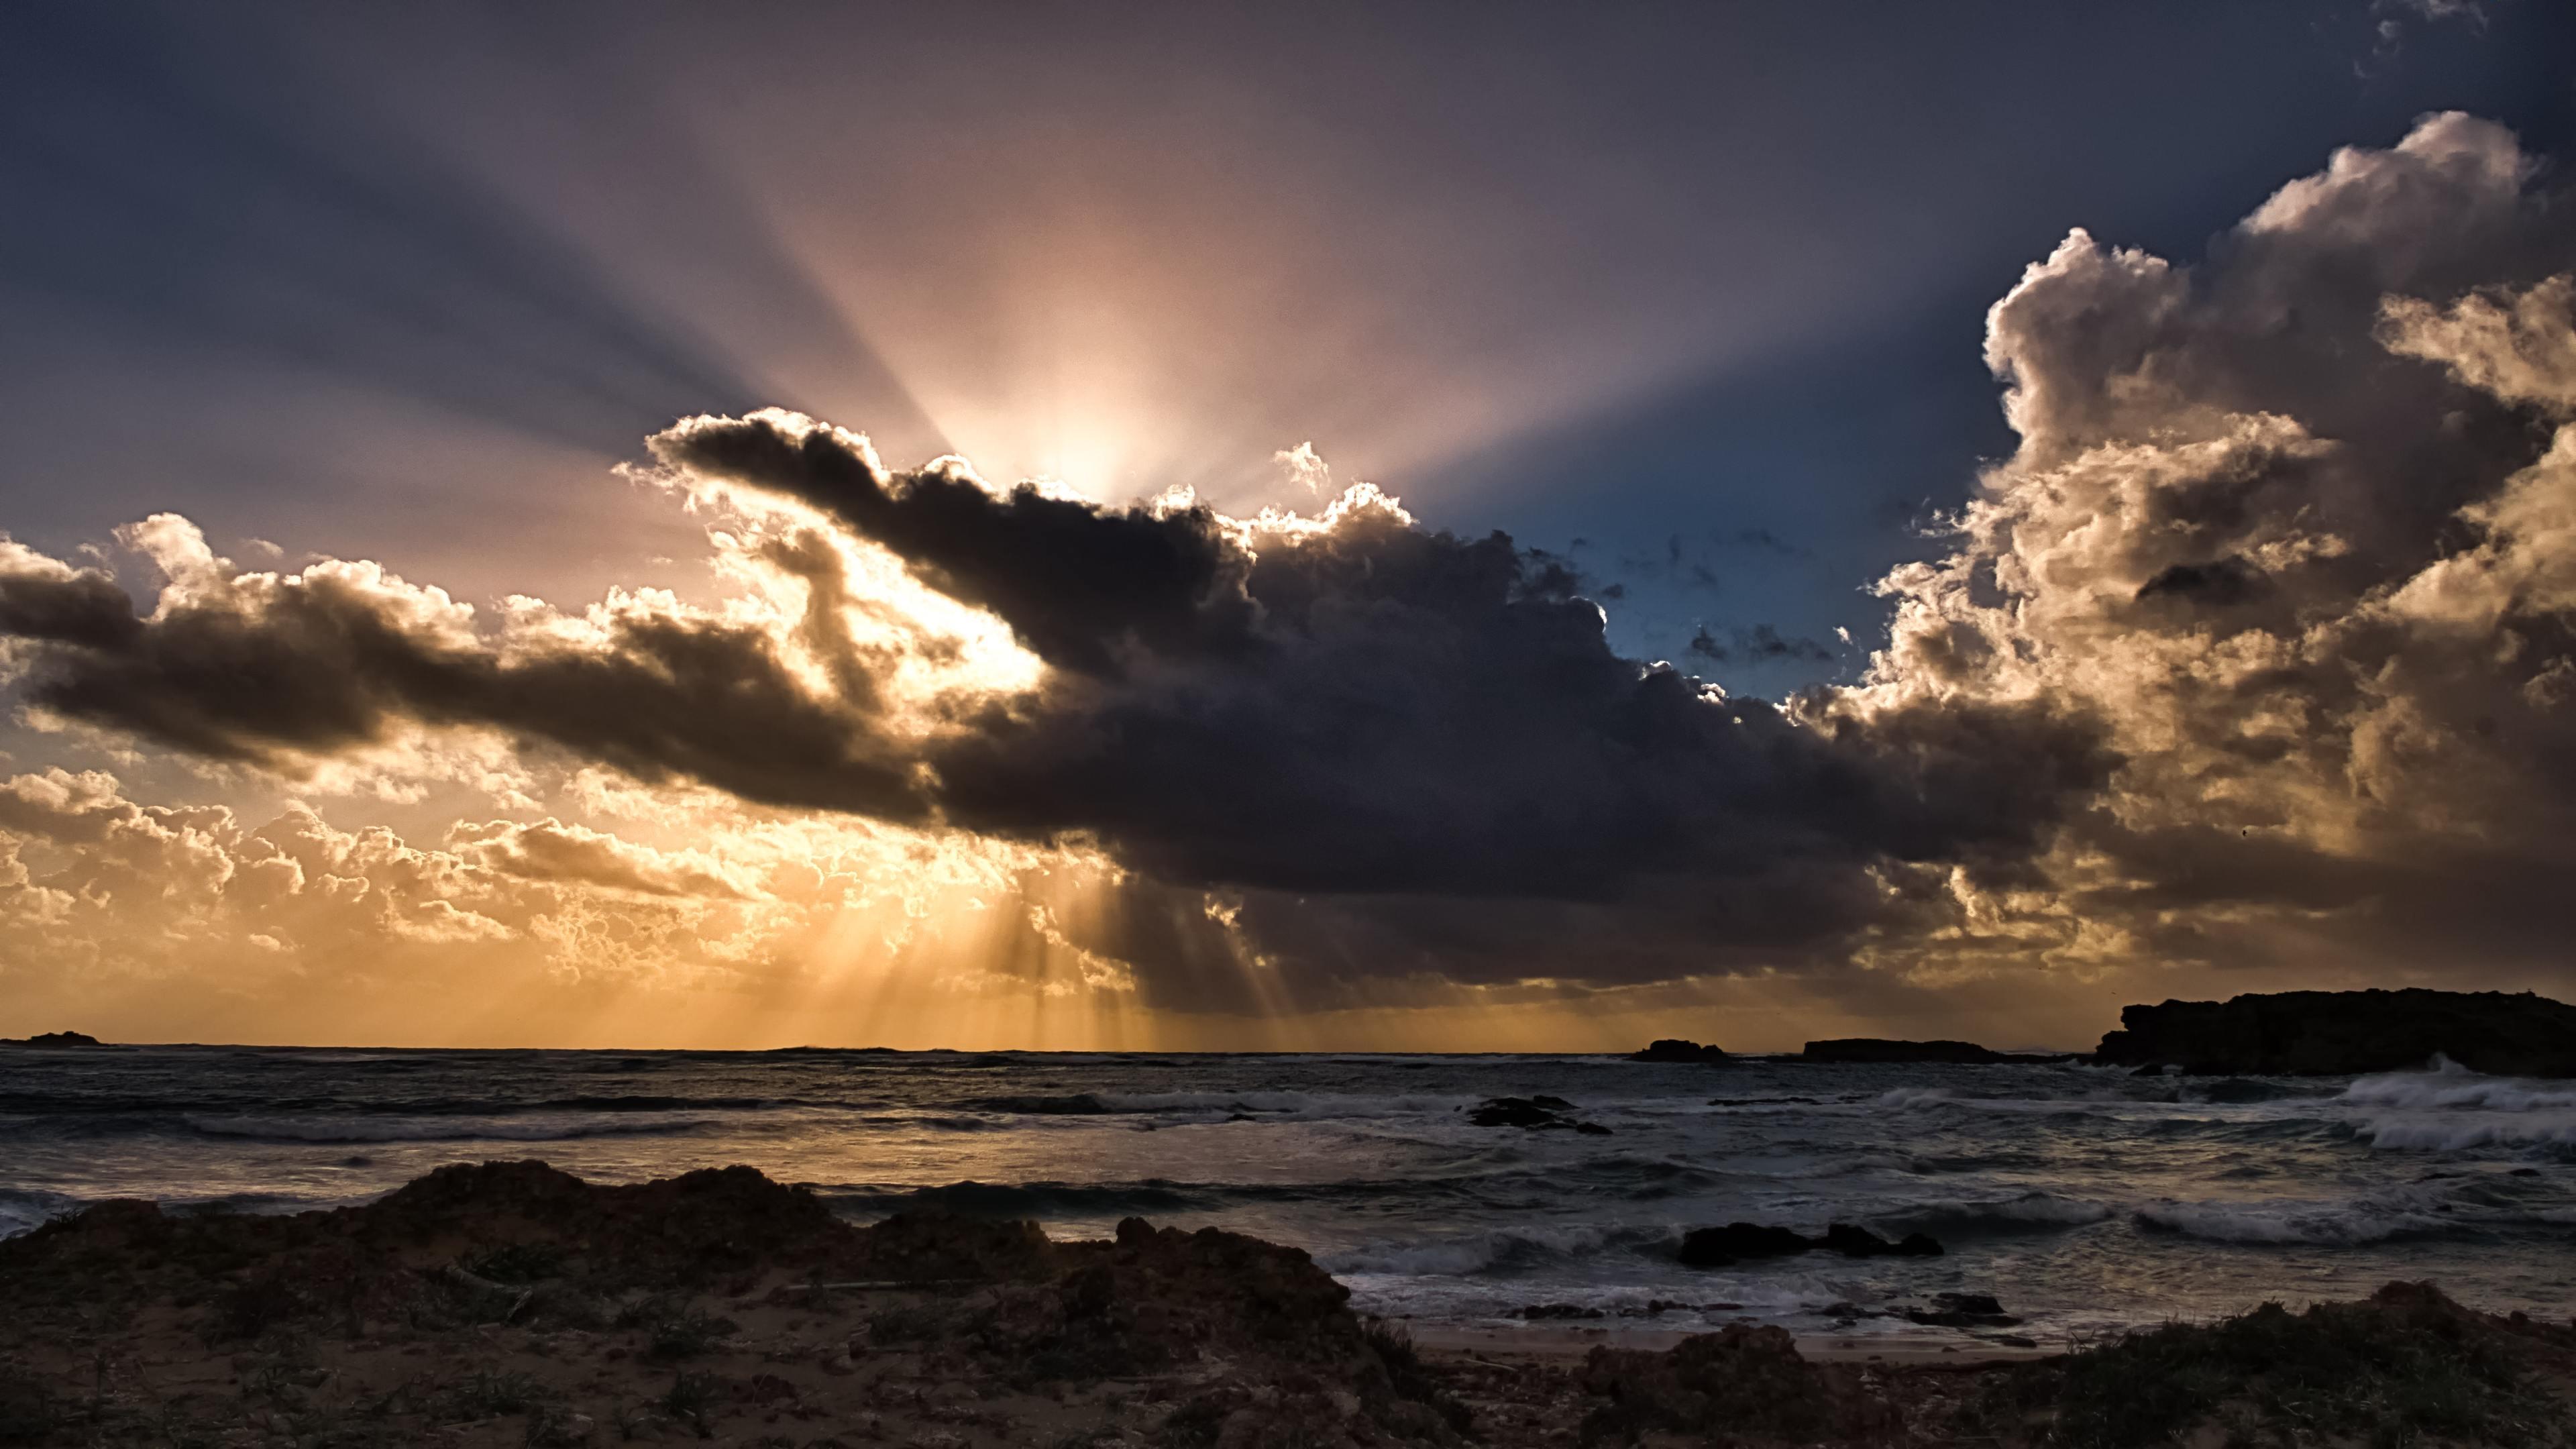 clouds sun rays passing ocean 4k 1540141093 - Clouds Sun Rays Passing Ocean 4k - sunbeam wallpapers, storm wallpapers, sky wallpapers, ocean wallpapers, nature wallpapers, hd-wallpapers, clouds wallpapers, 5k wallpapers, 4k-wallpapers